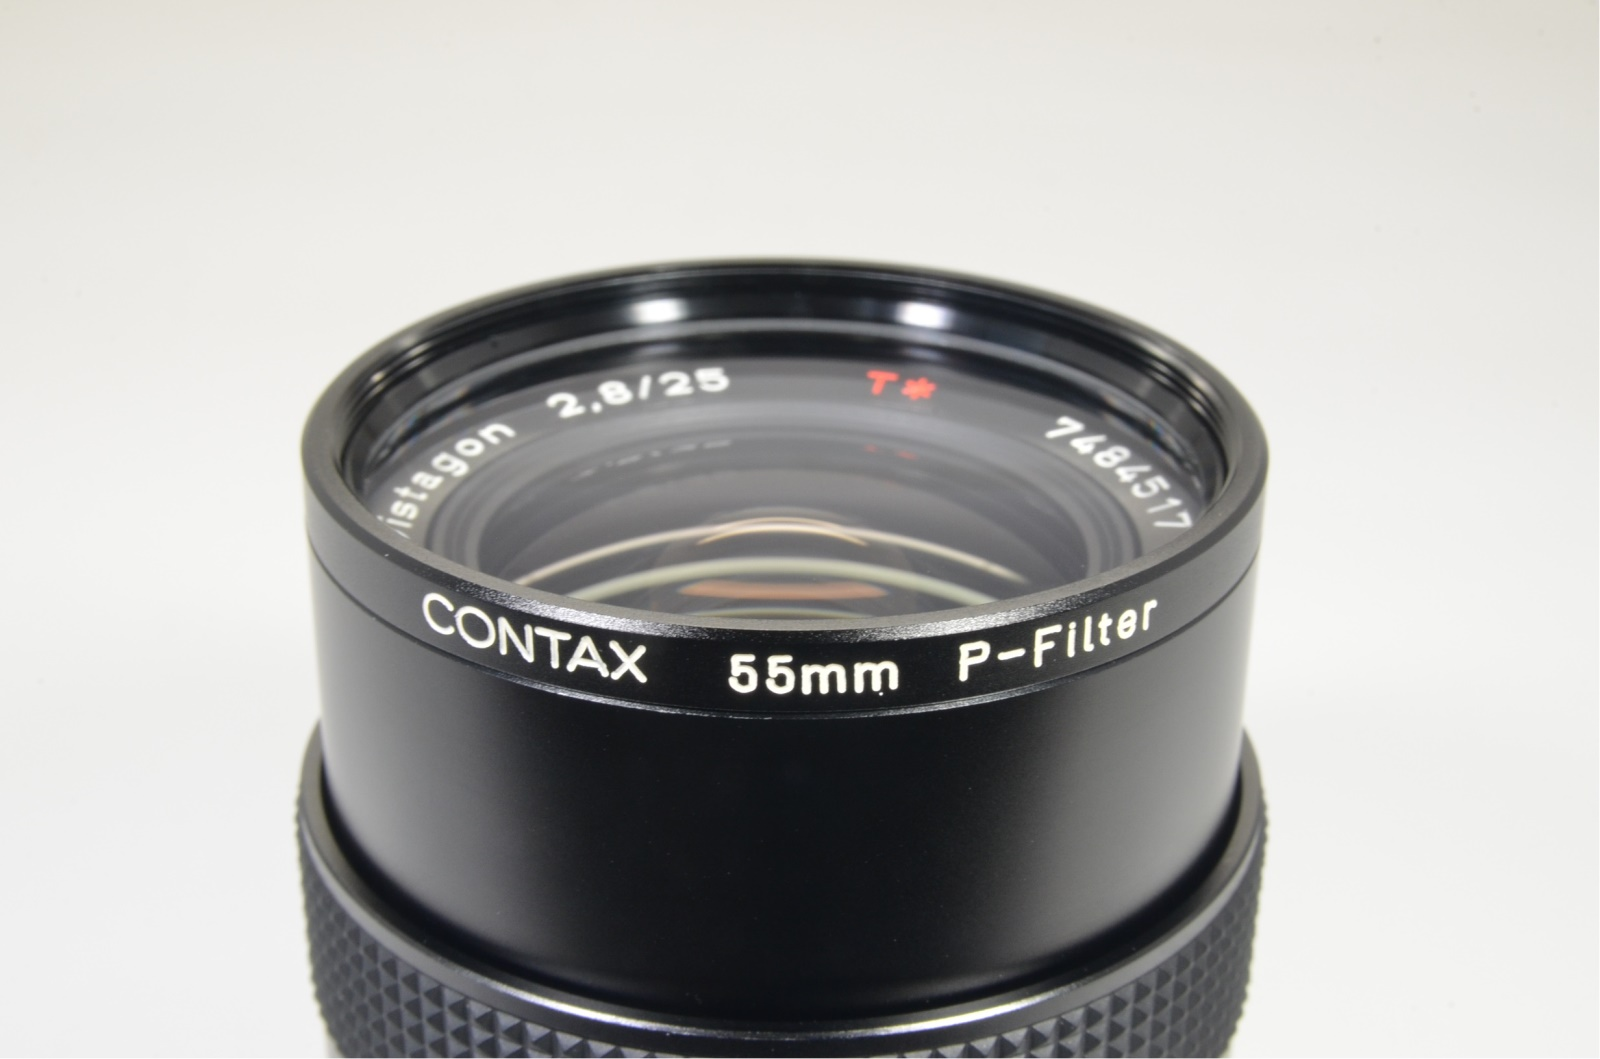 contax carl zeiss distagon t* 25mm f2.8 mmj japan near mint shooting tested